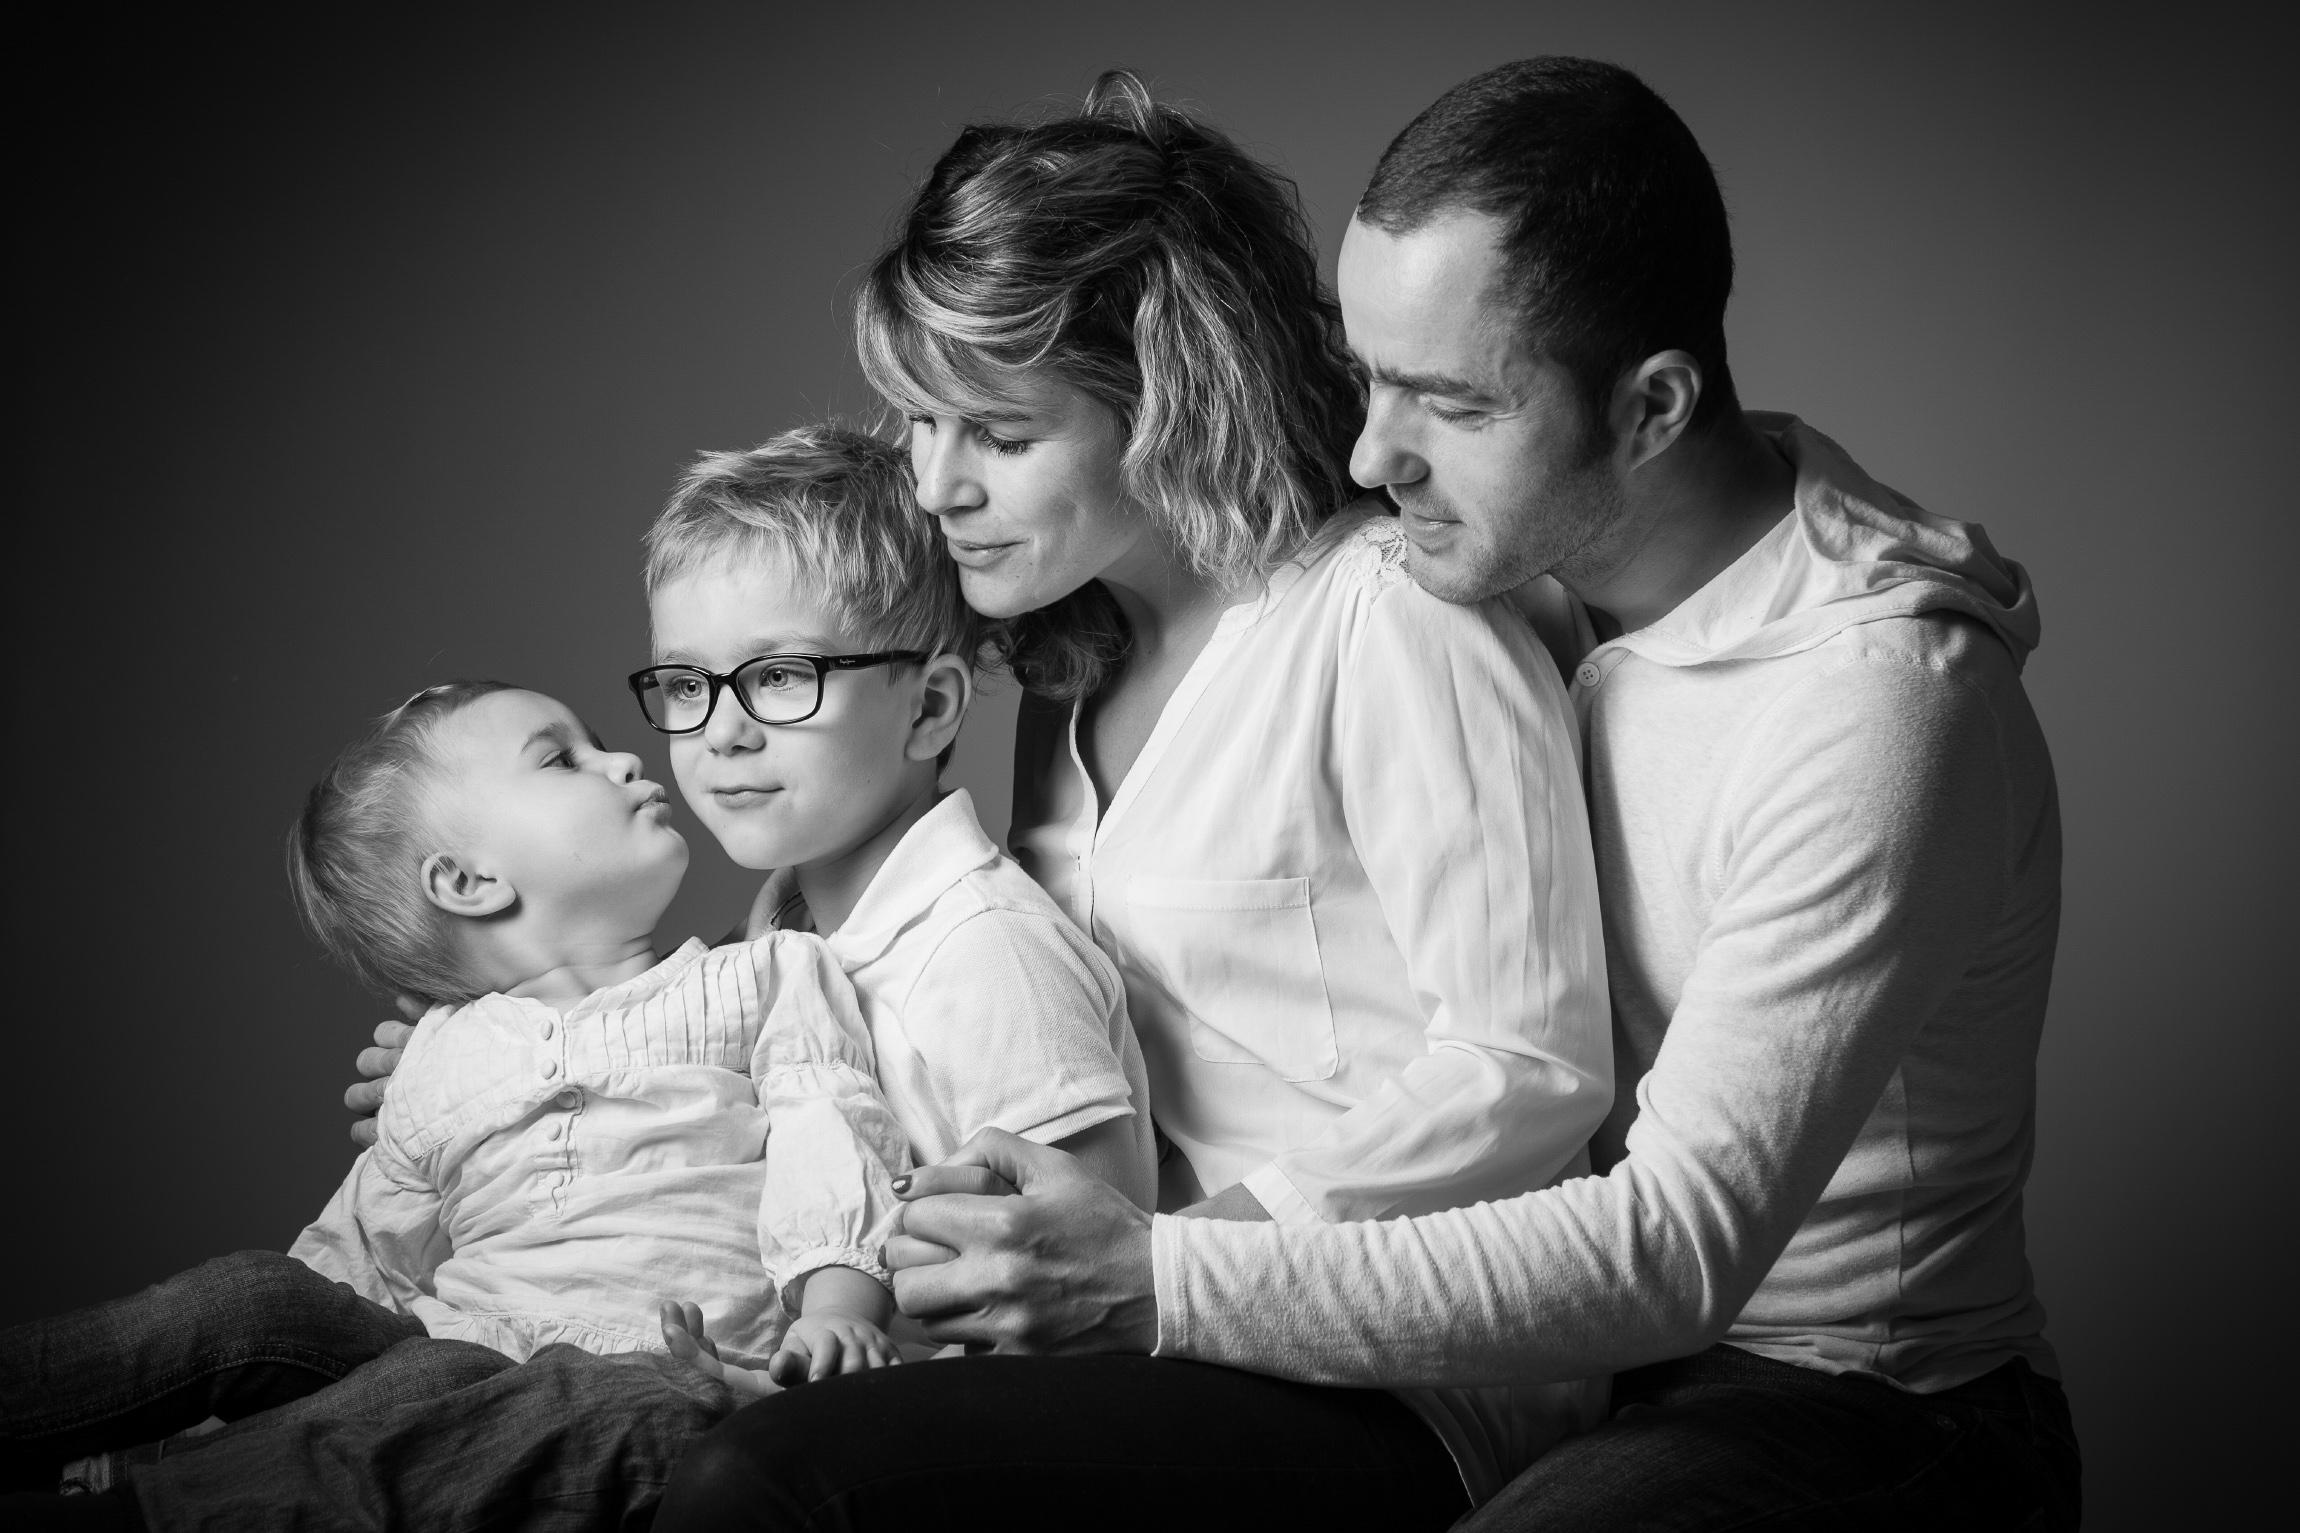 03-foto-familia-celine-pech-andorra61